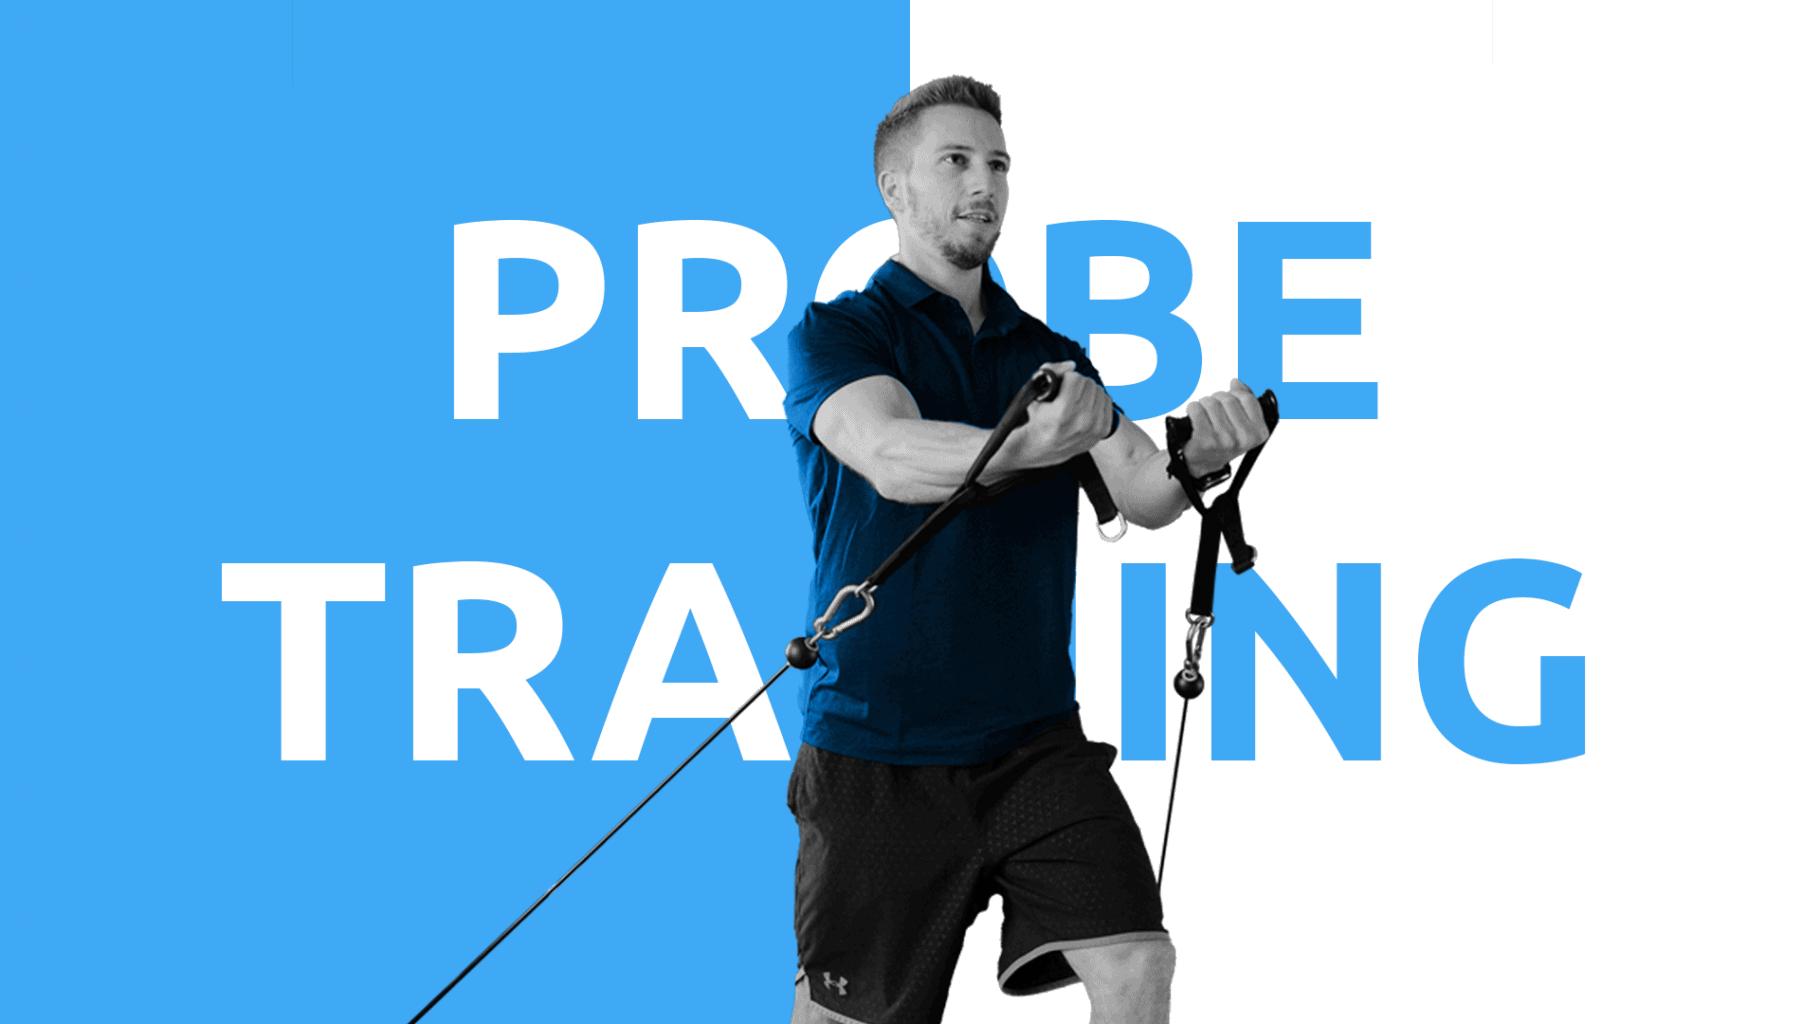 Probetraining Personal Training